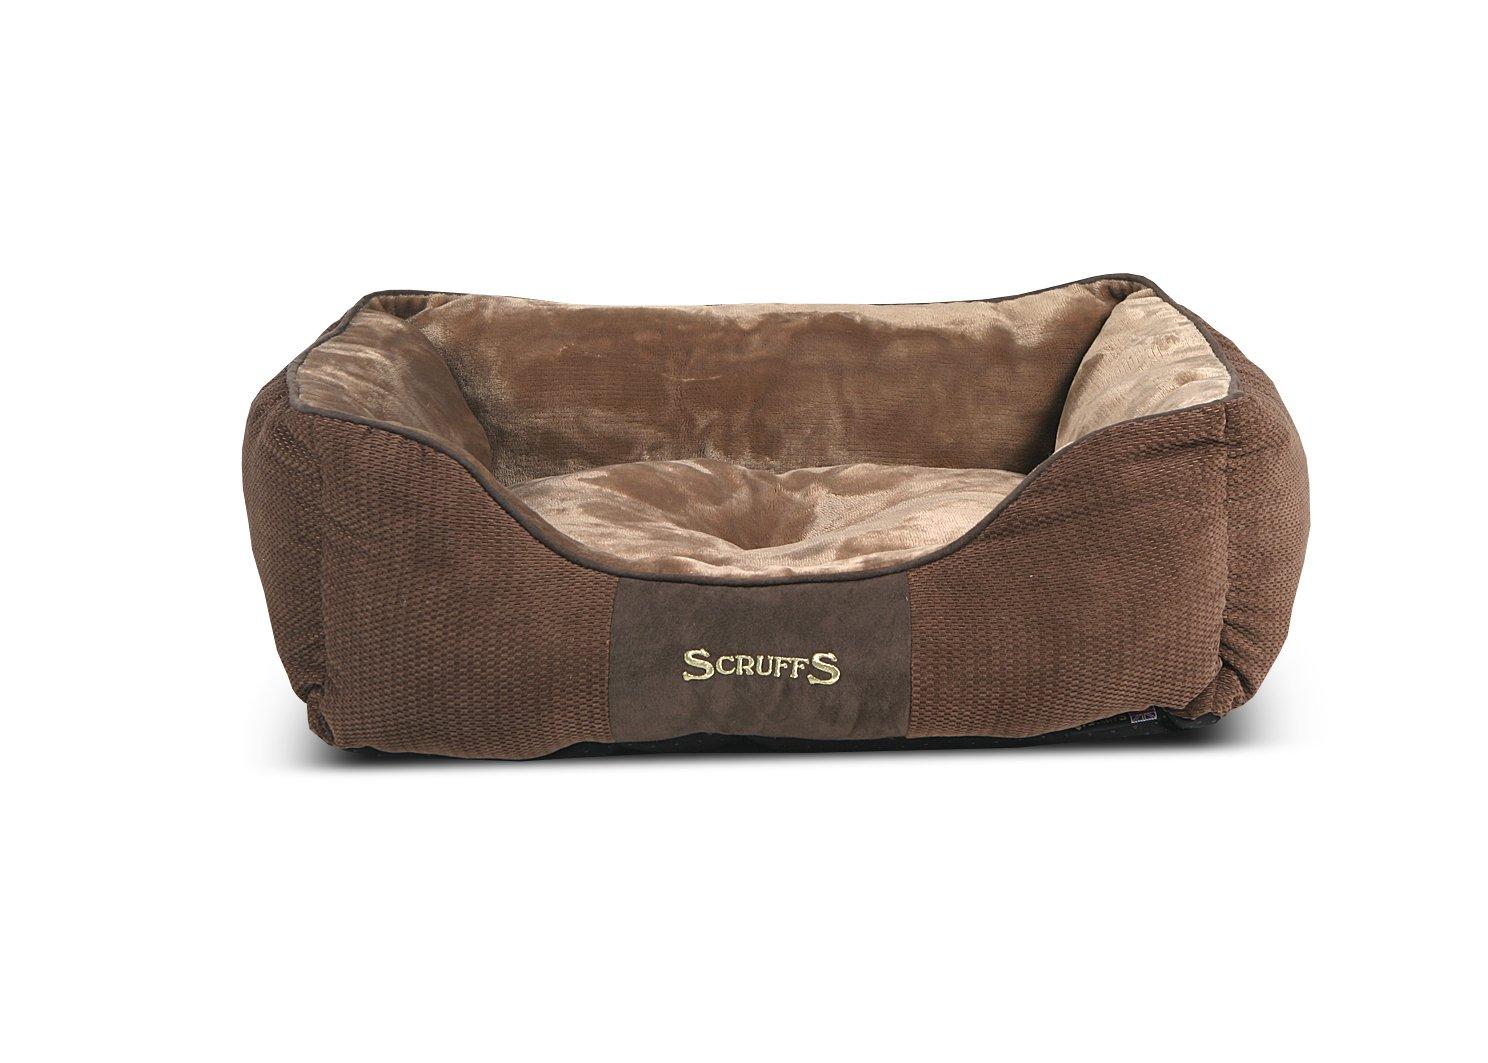 Scruffs Dog Box Bed, Chocolate